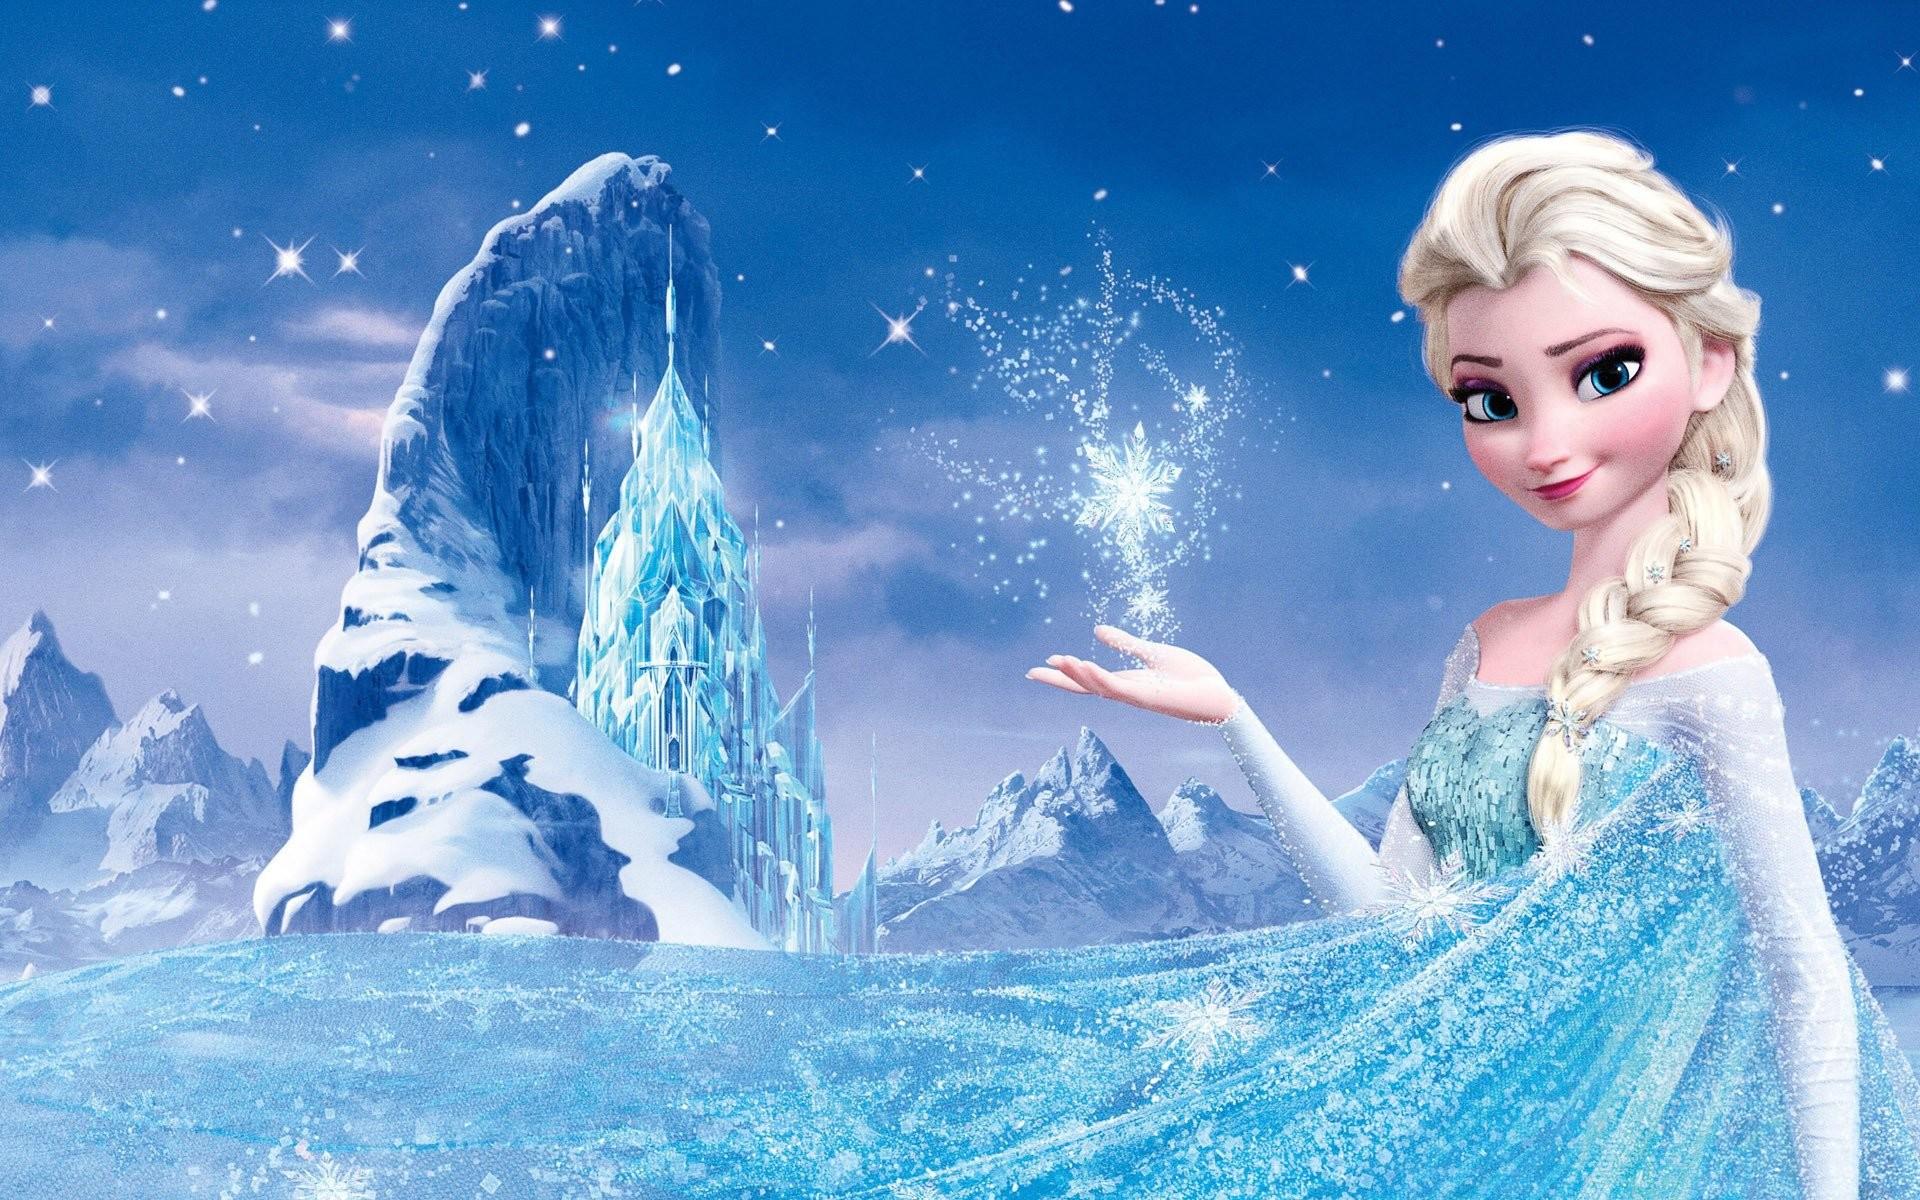 Res: 1920x1200, Best Frozen Wallpaper Background High Quality Widescreen Cartoon Disney  Backgrounds Of Laptop